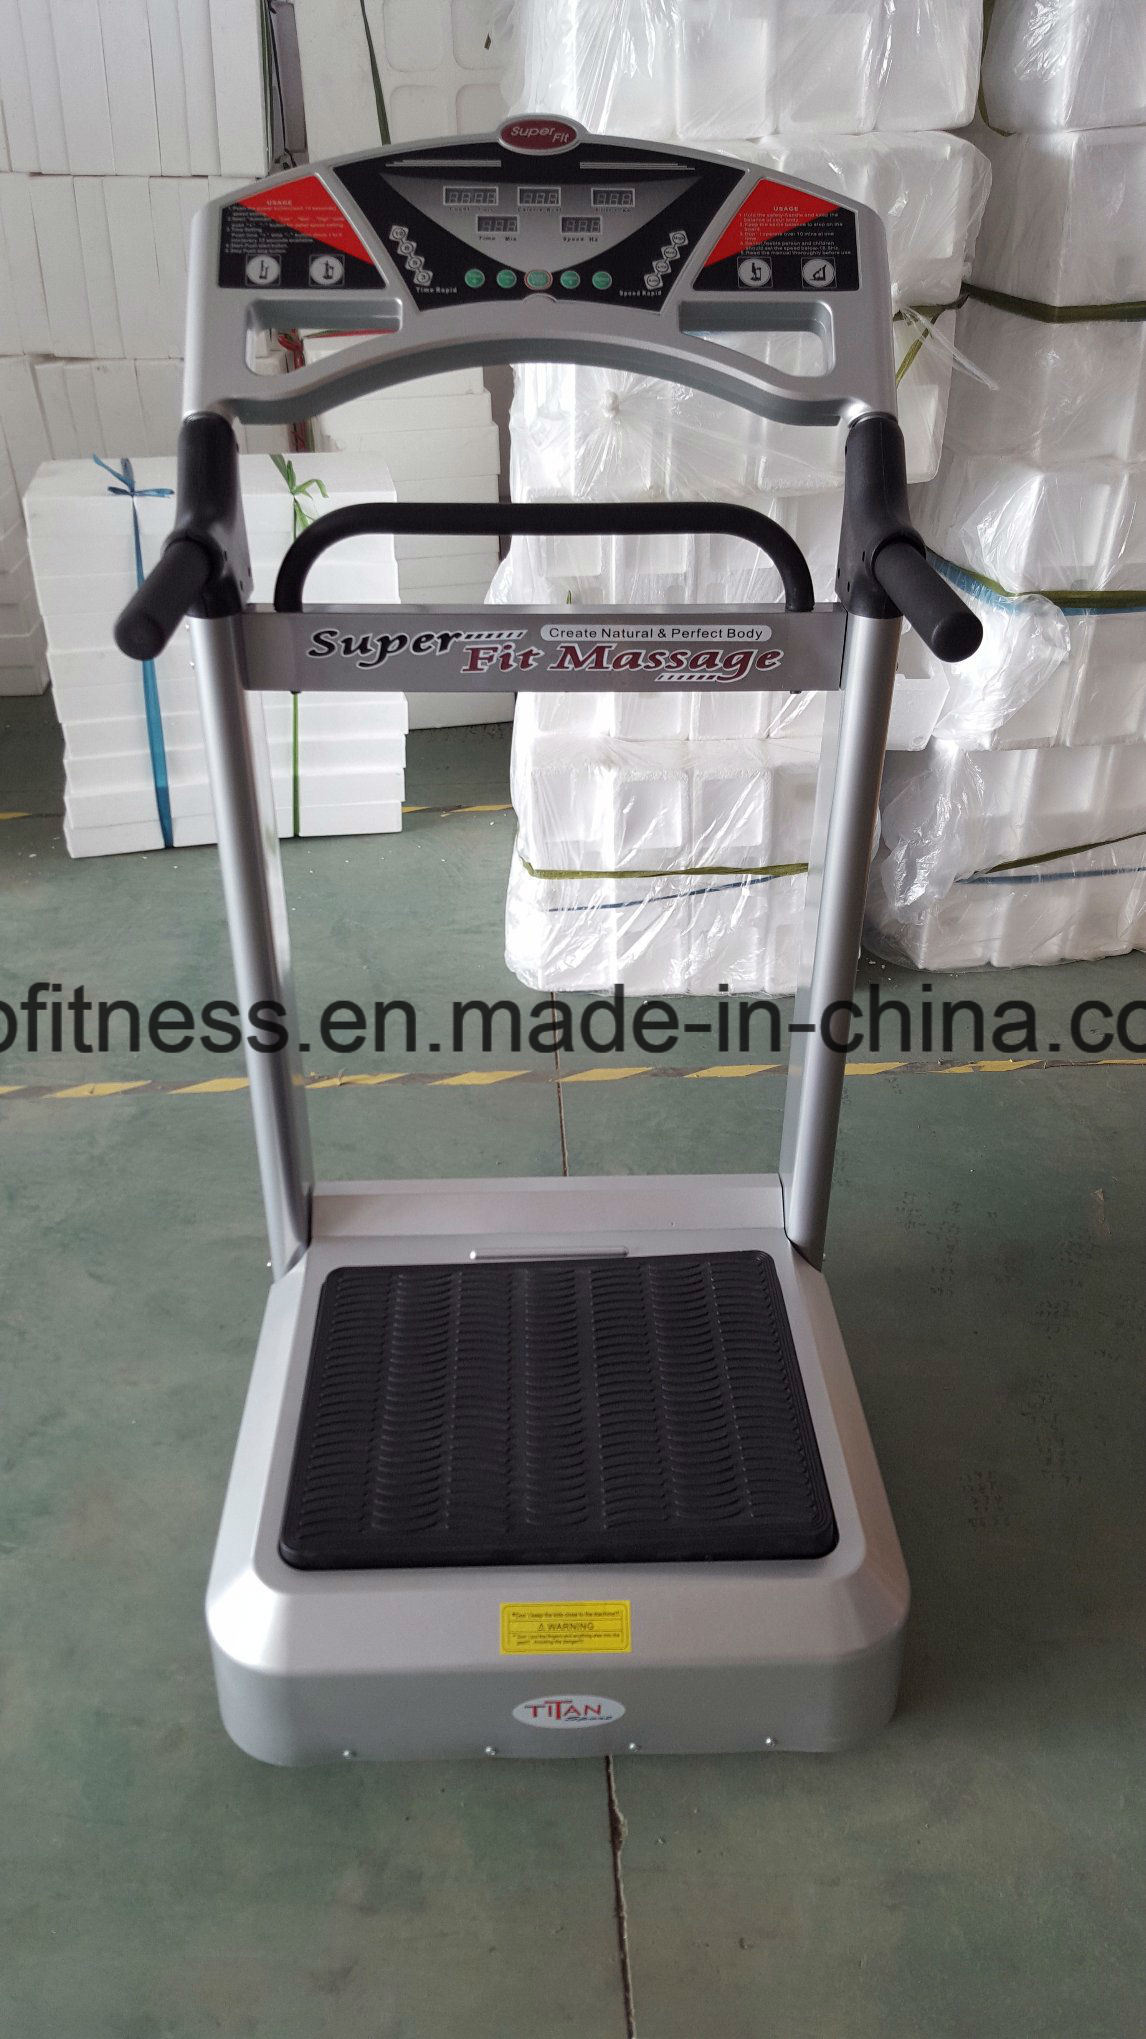 Whole Body Vibration Machine Crazy Fitness Machine Crazy Fit Massager